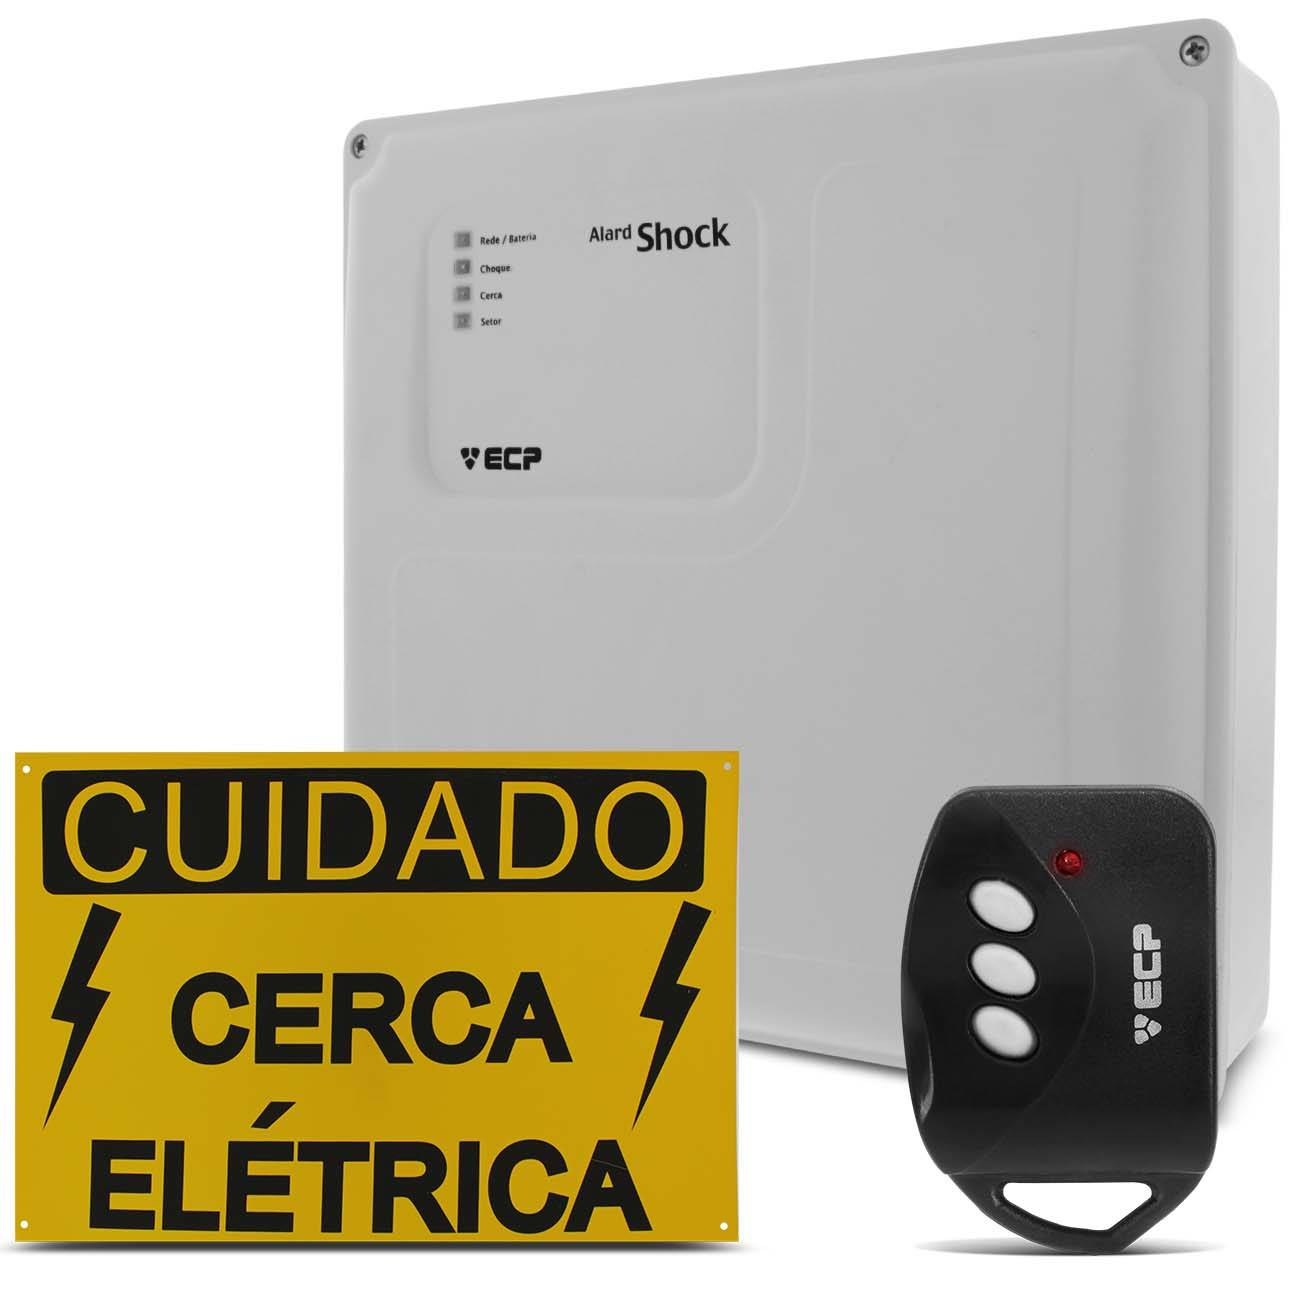 Central Painel Cerca Elétrica Ecp Alard Shock Control